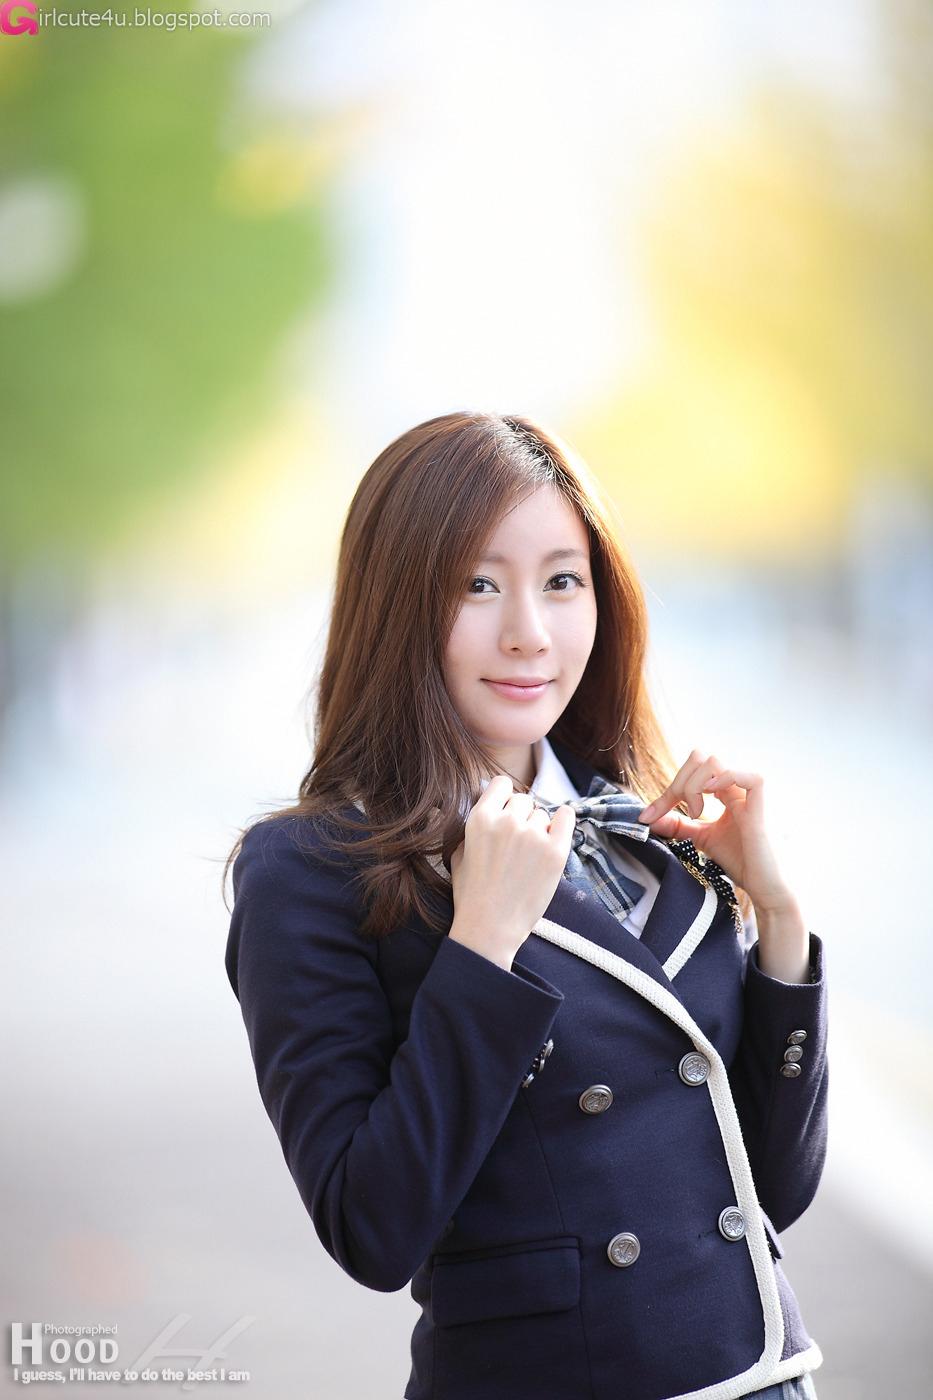 xxx nude girls: Very cute asian girl Sexy Han Ga Eun